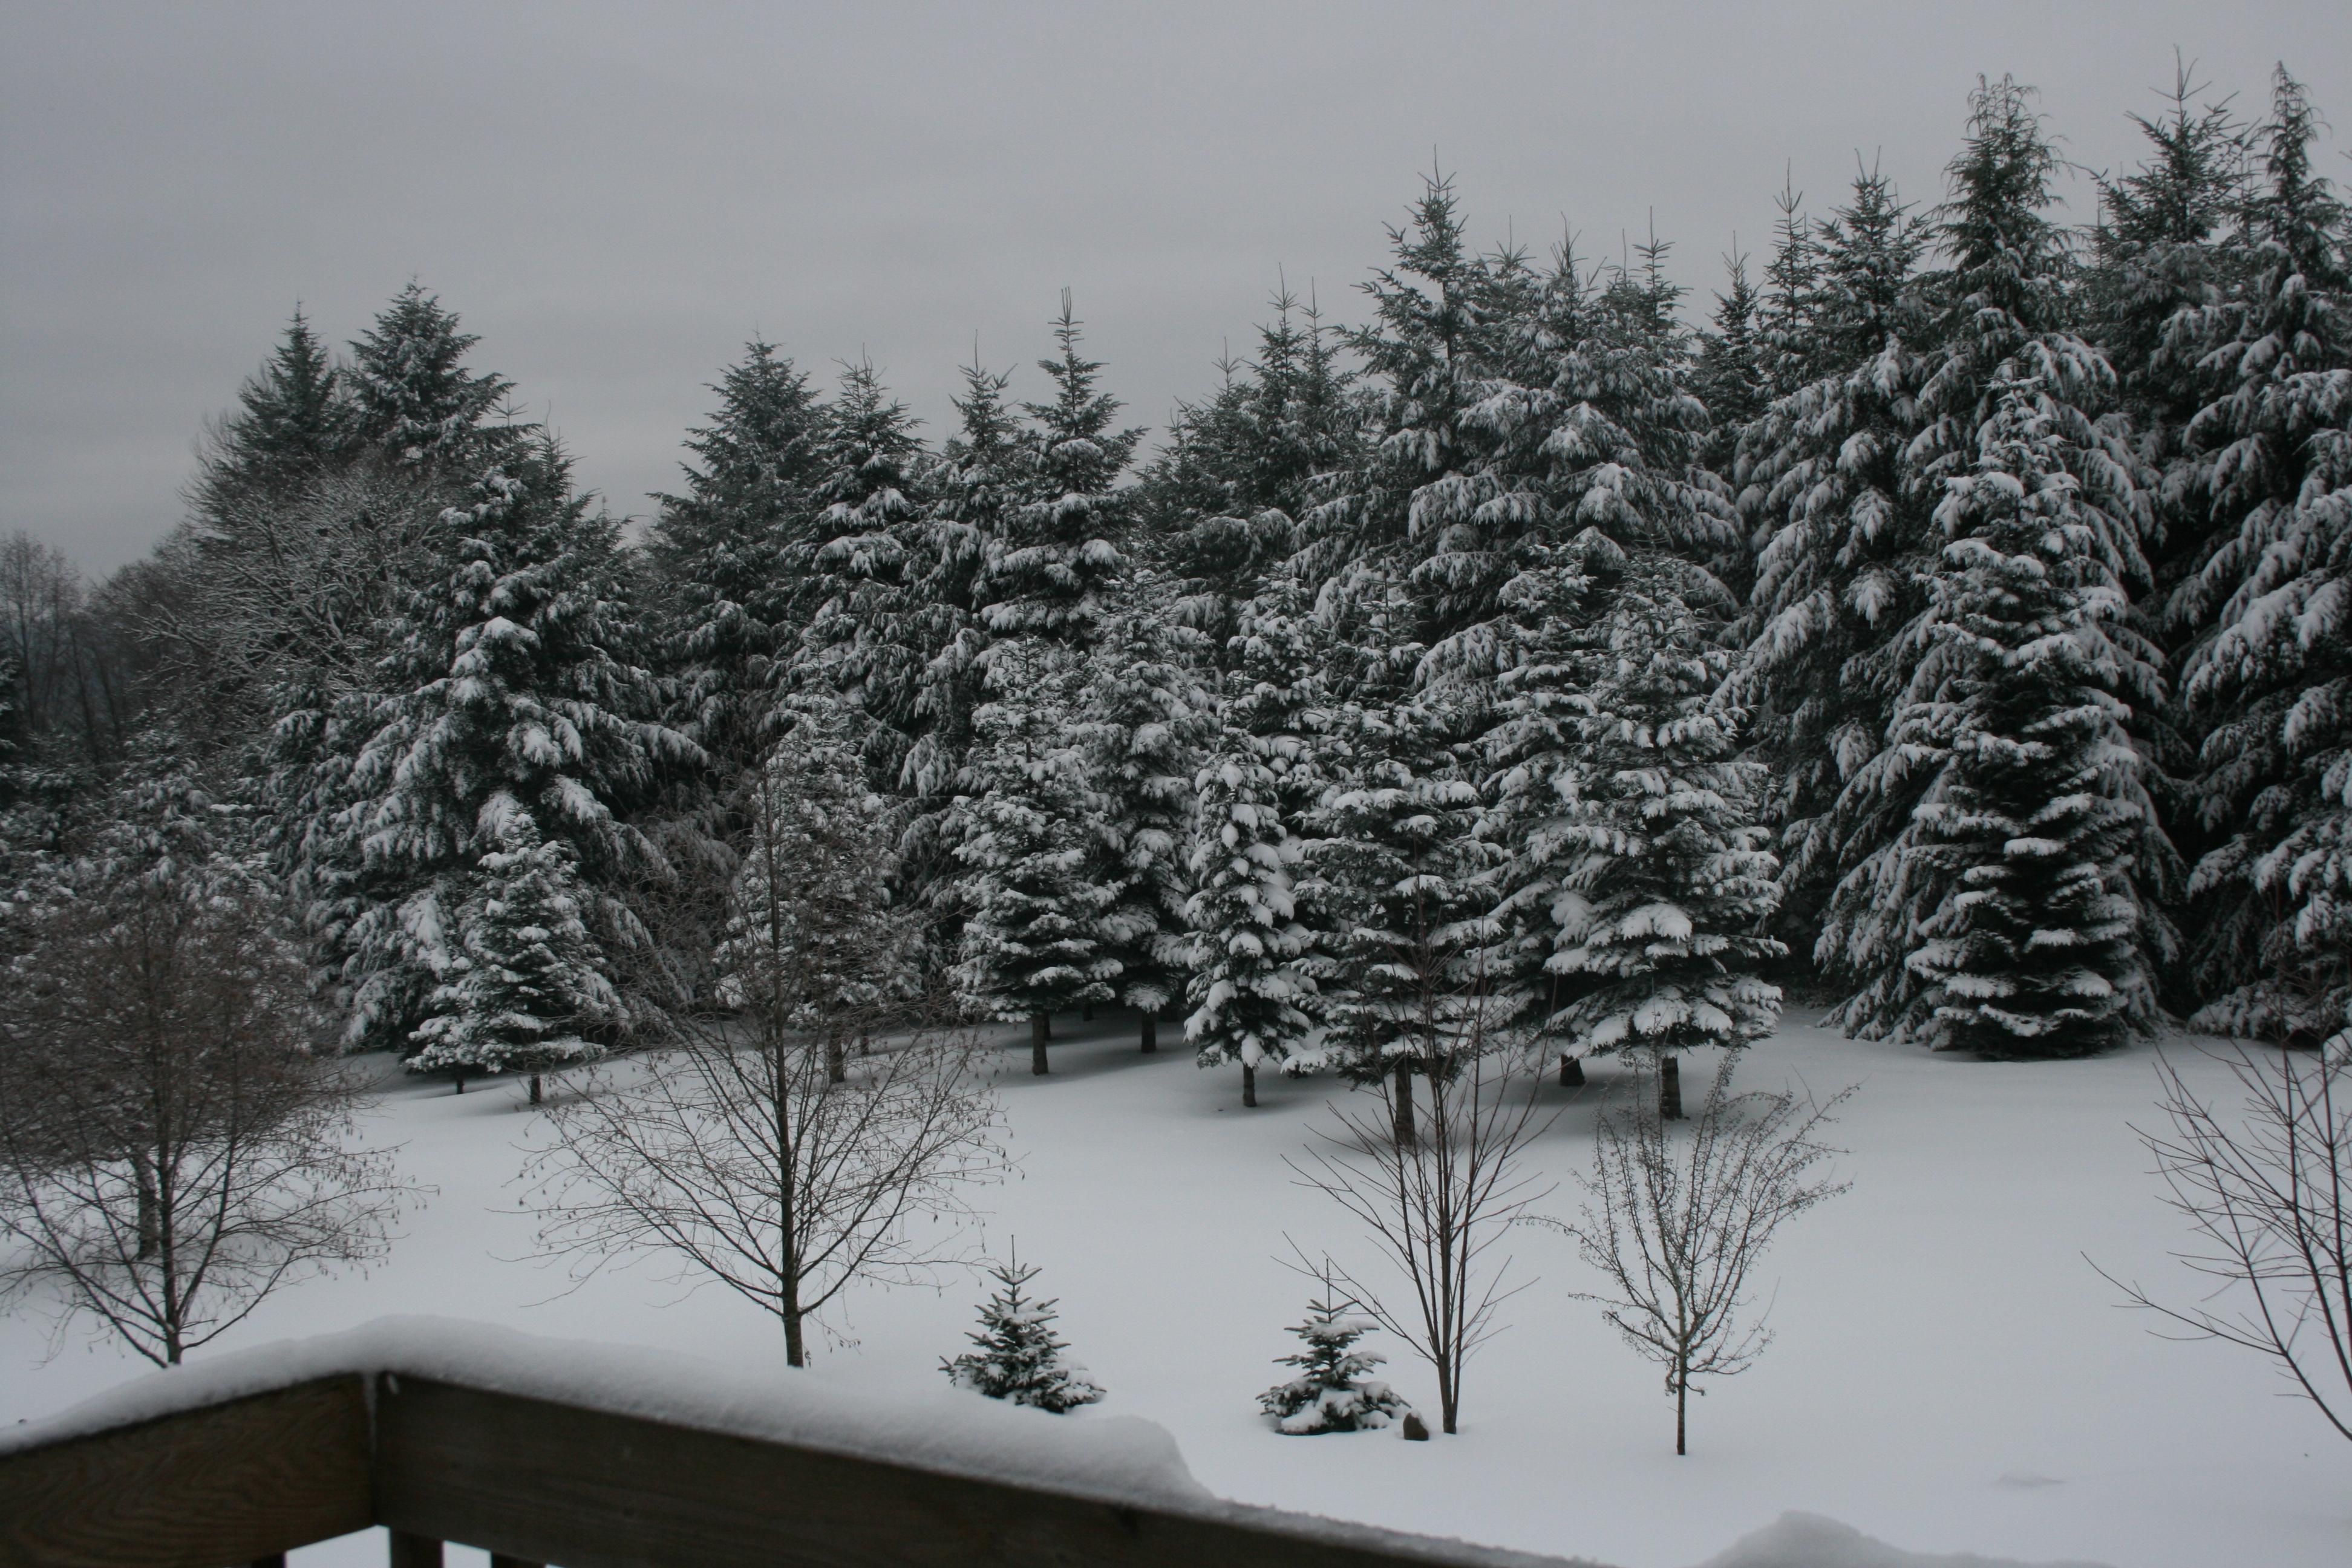 Snow December 2008 at FoPaws